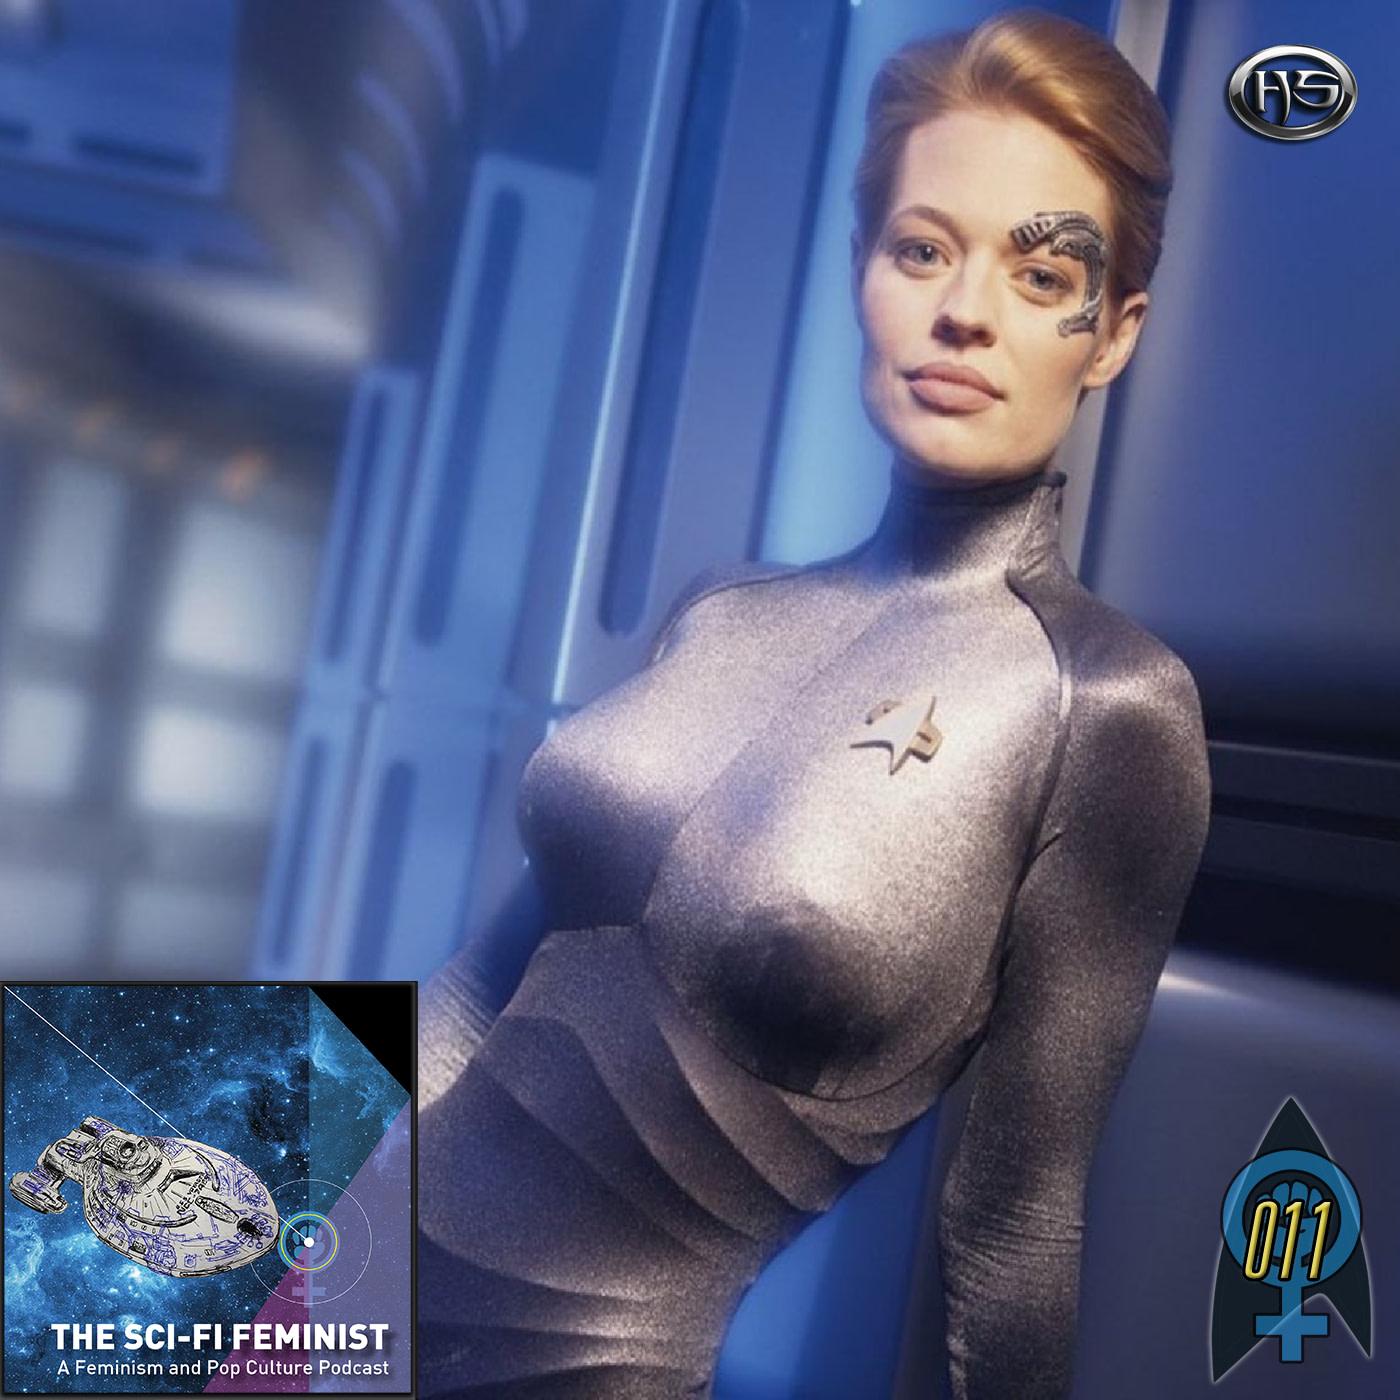 The Sci-Fi Feminist Episode 11